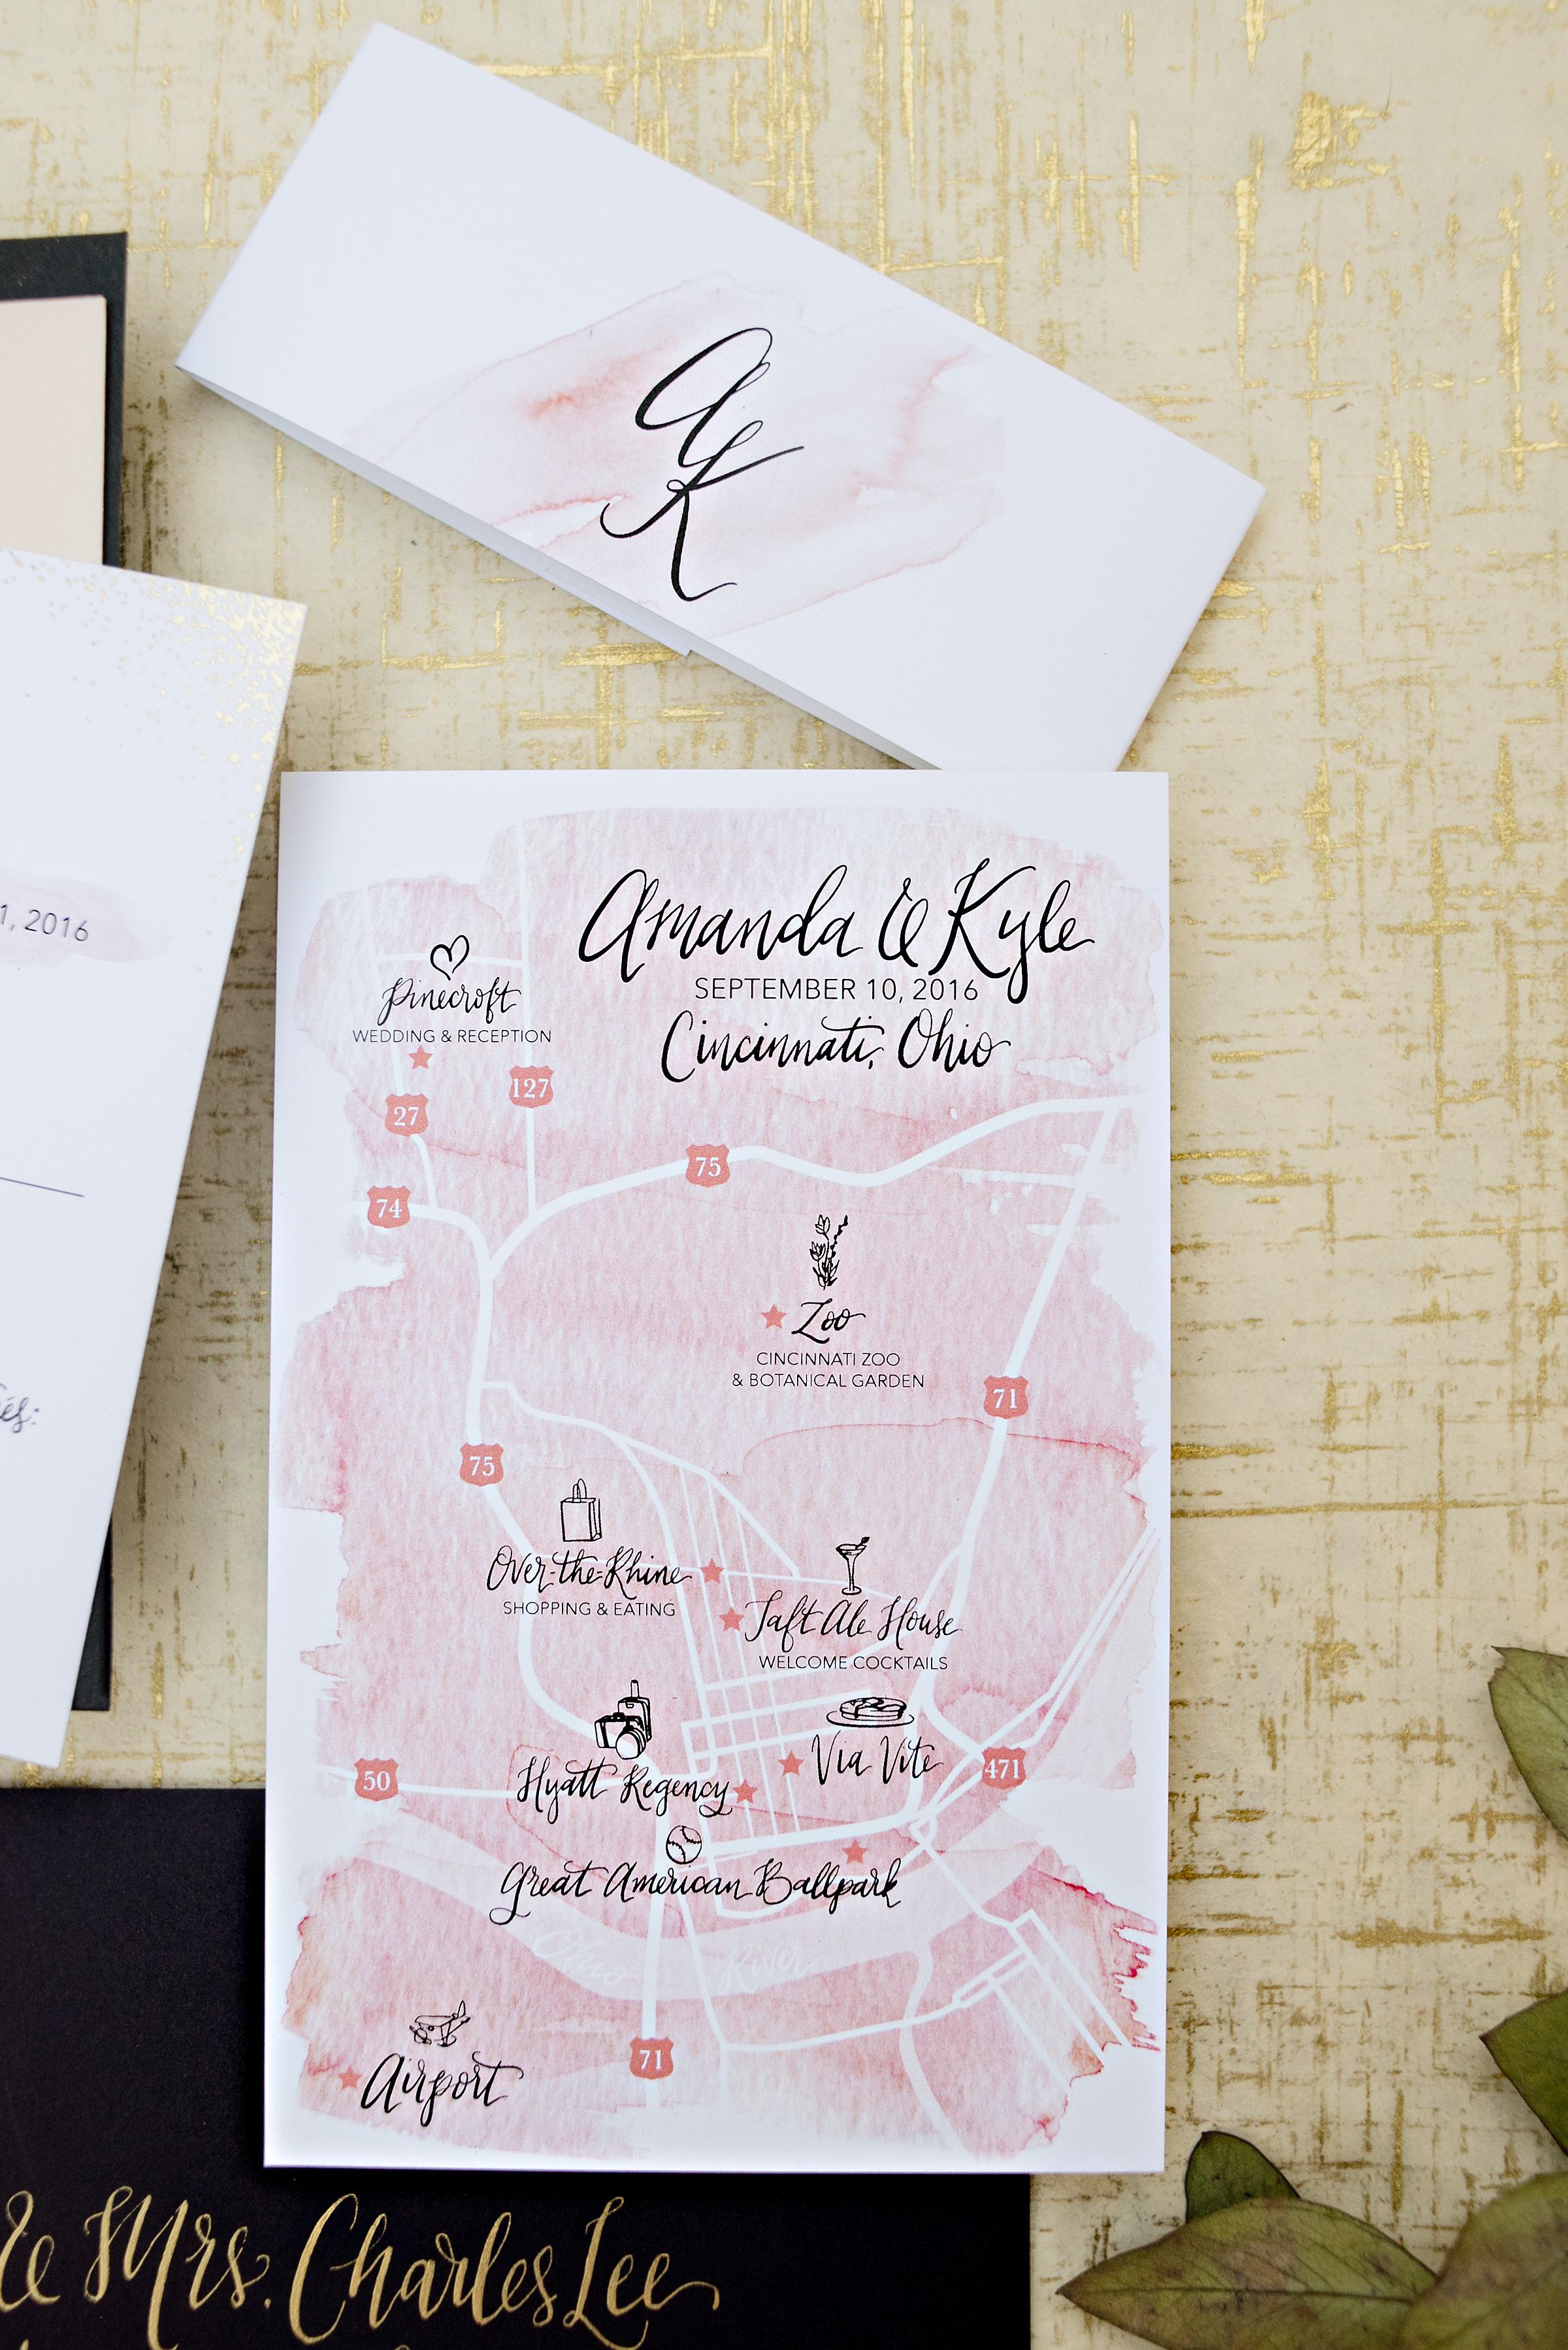 Cincinnati, Ohio Wedding Map